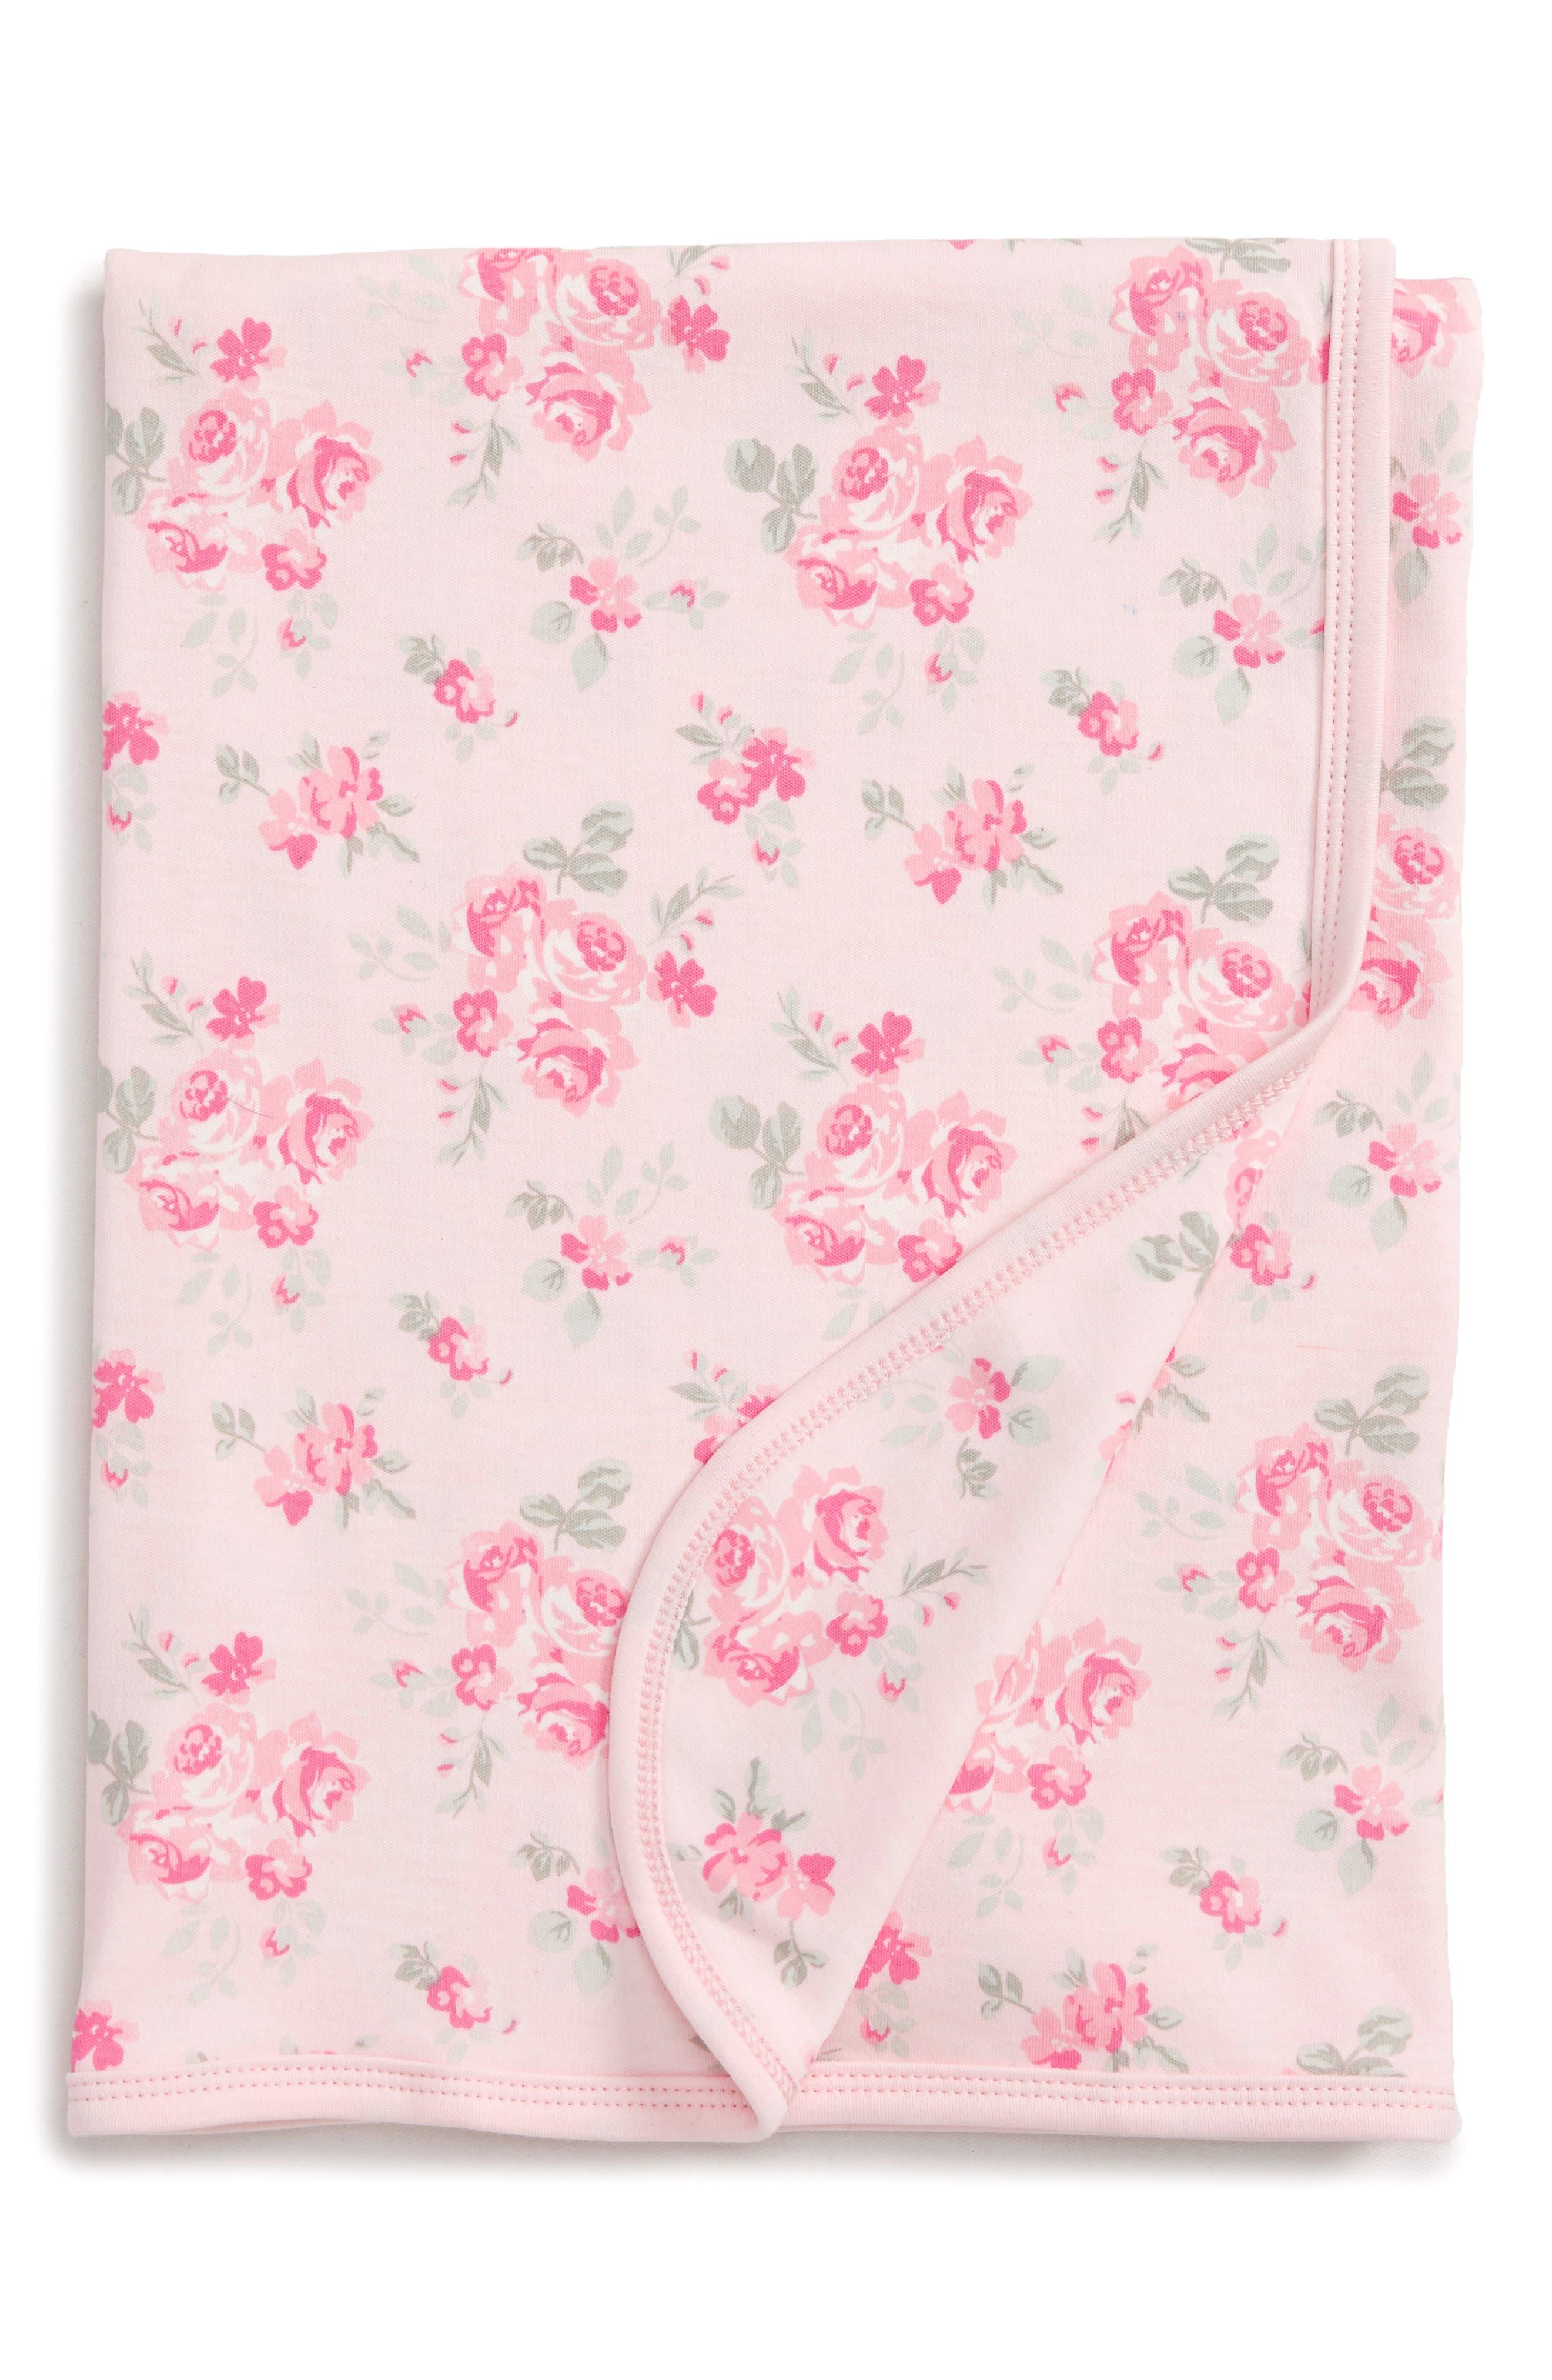 Little Me Pink Rose Receiving Blanket (Nordstrom Exclusive)